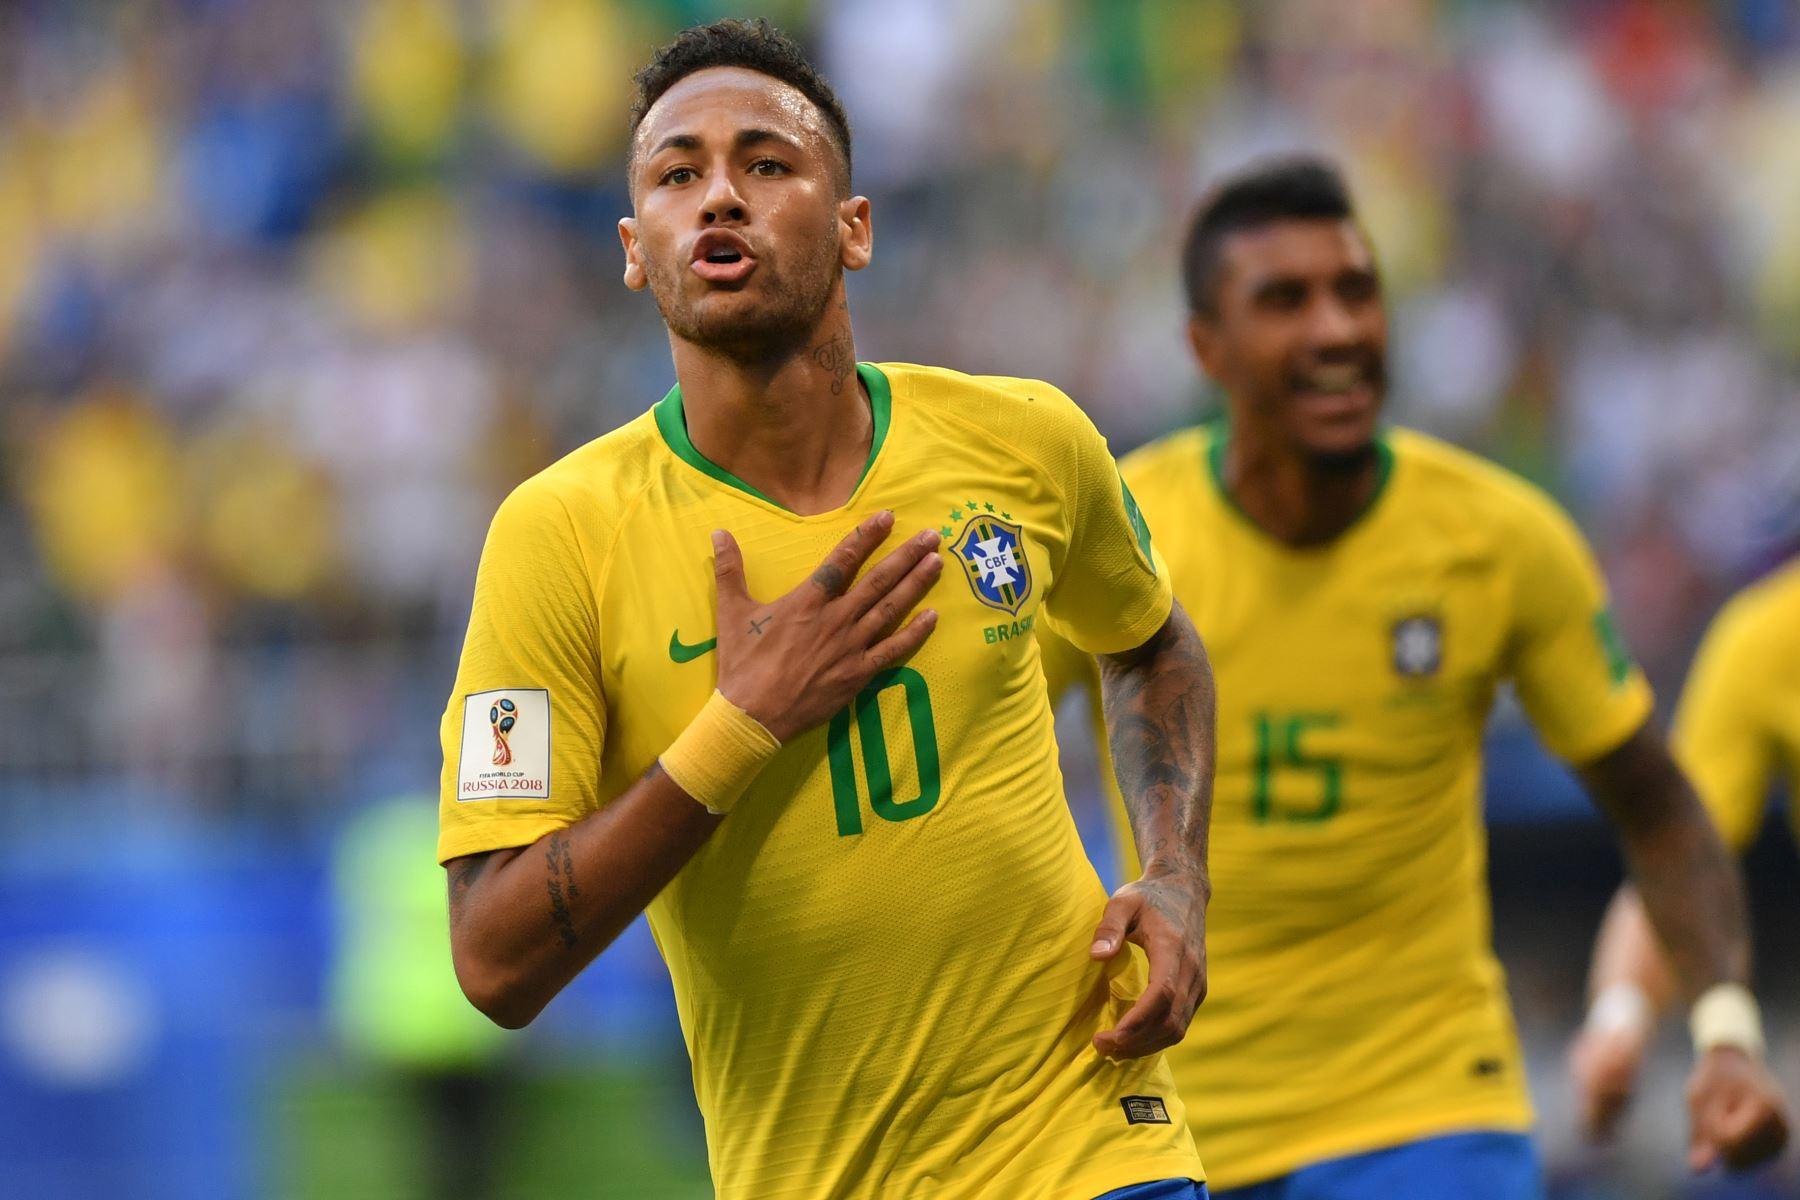 Neymar encabeza convocados de Brasil para enfrentar a Perú en eliminatorias | Noticias